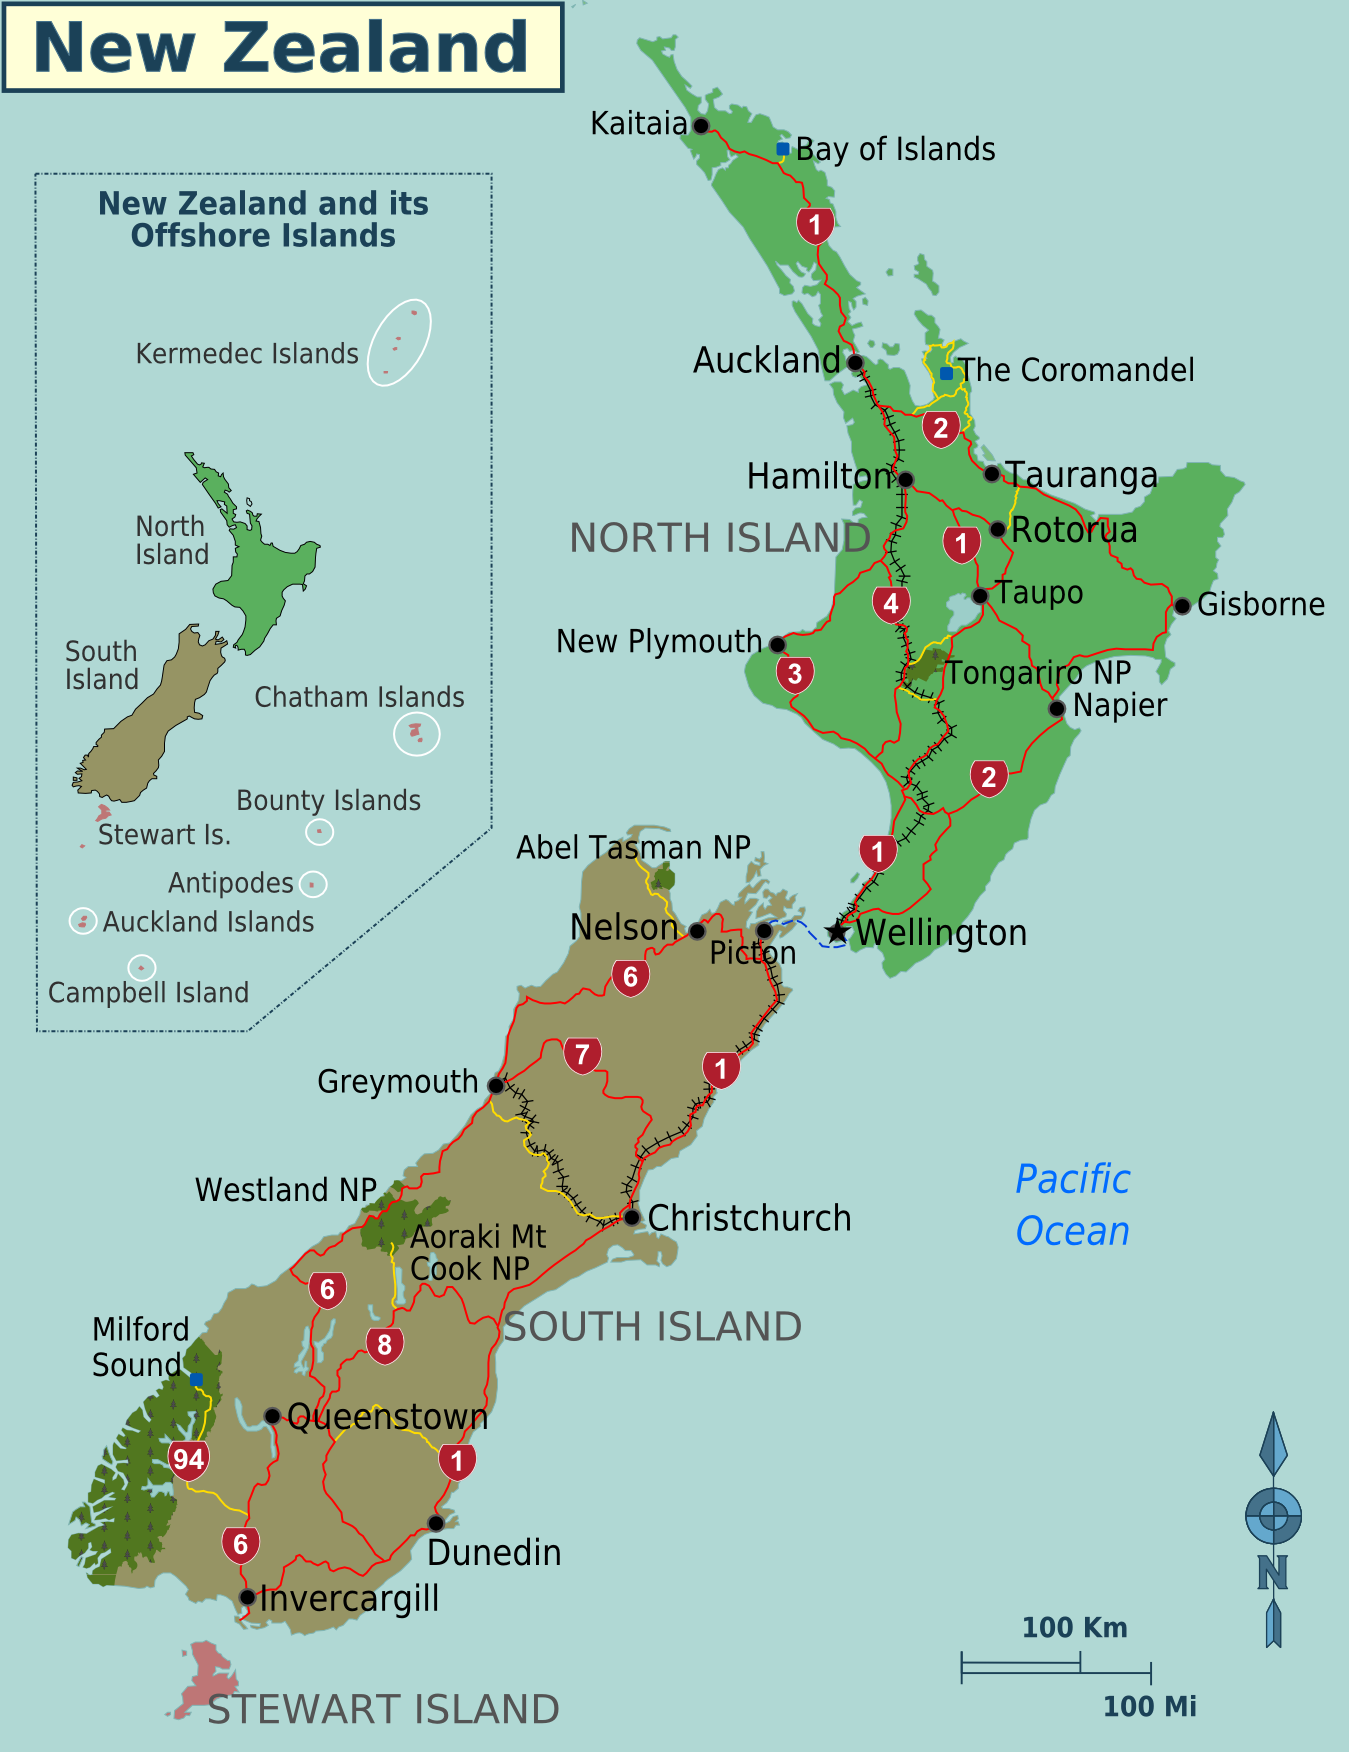 neuseeland landkarte Landkarte Neuseeland (Regionen) : Weltkarte.  Karten und  neuseeland landkarte